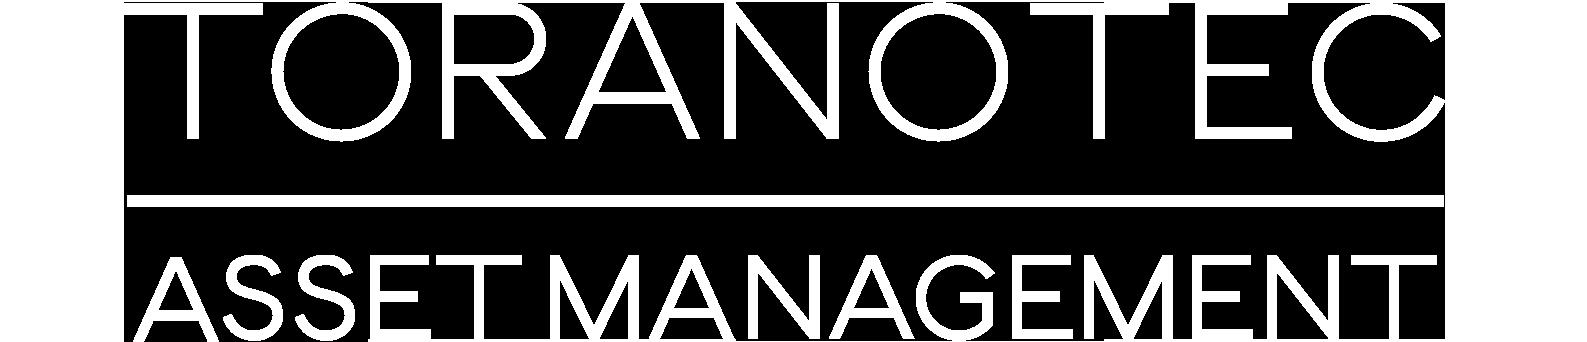 TORANOTEC投信投資顧問株式会社